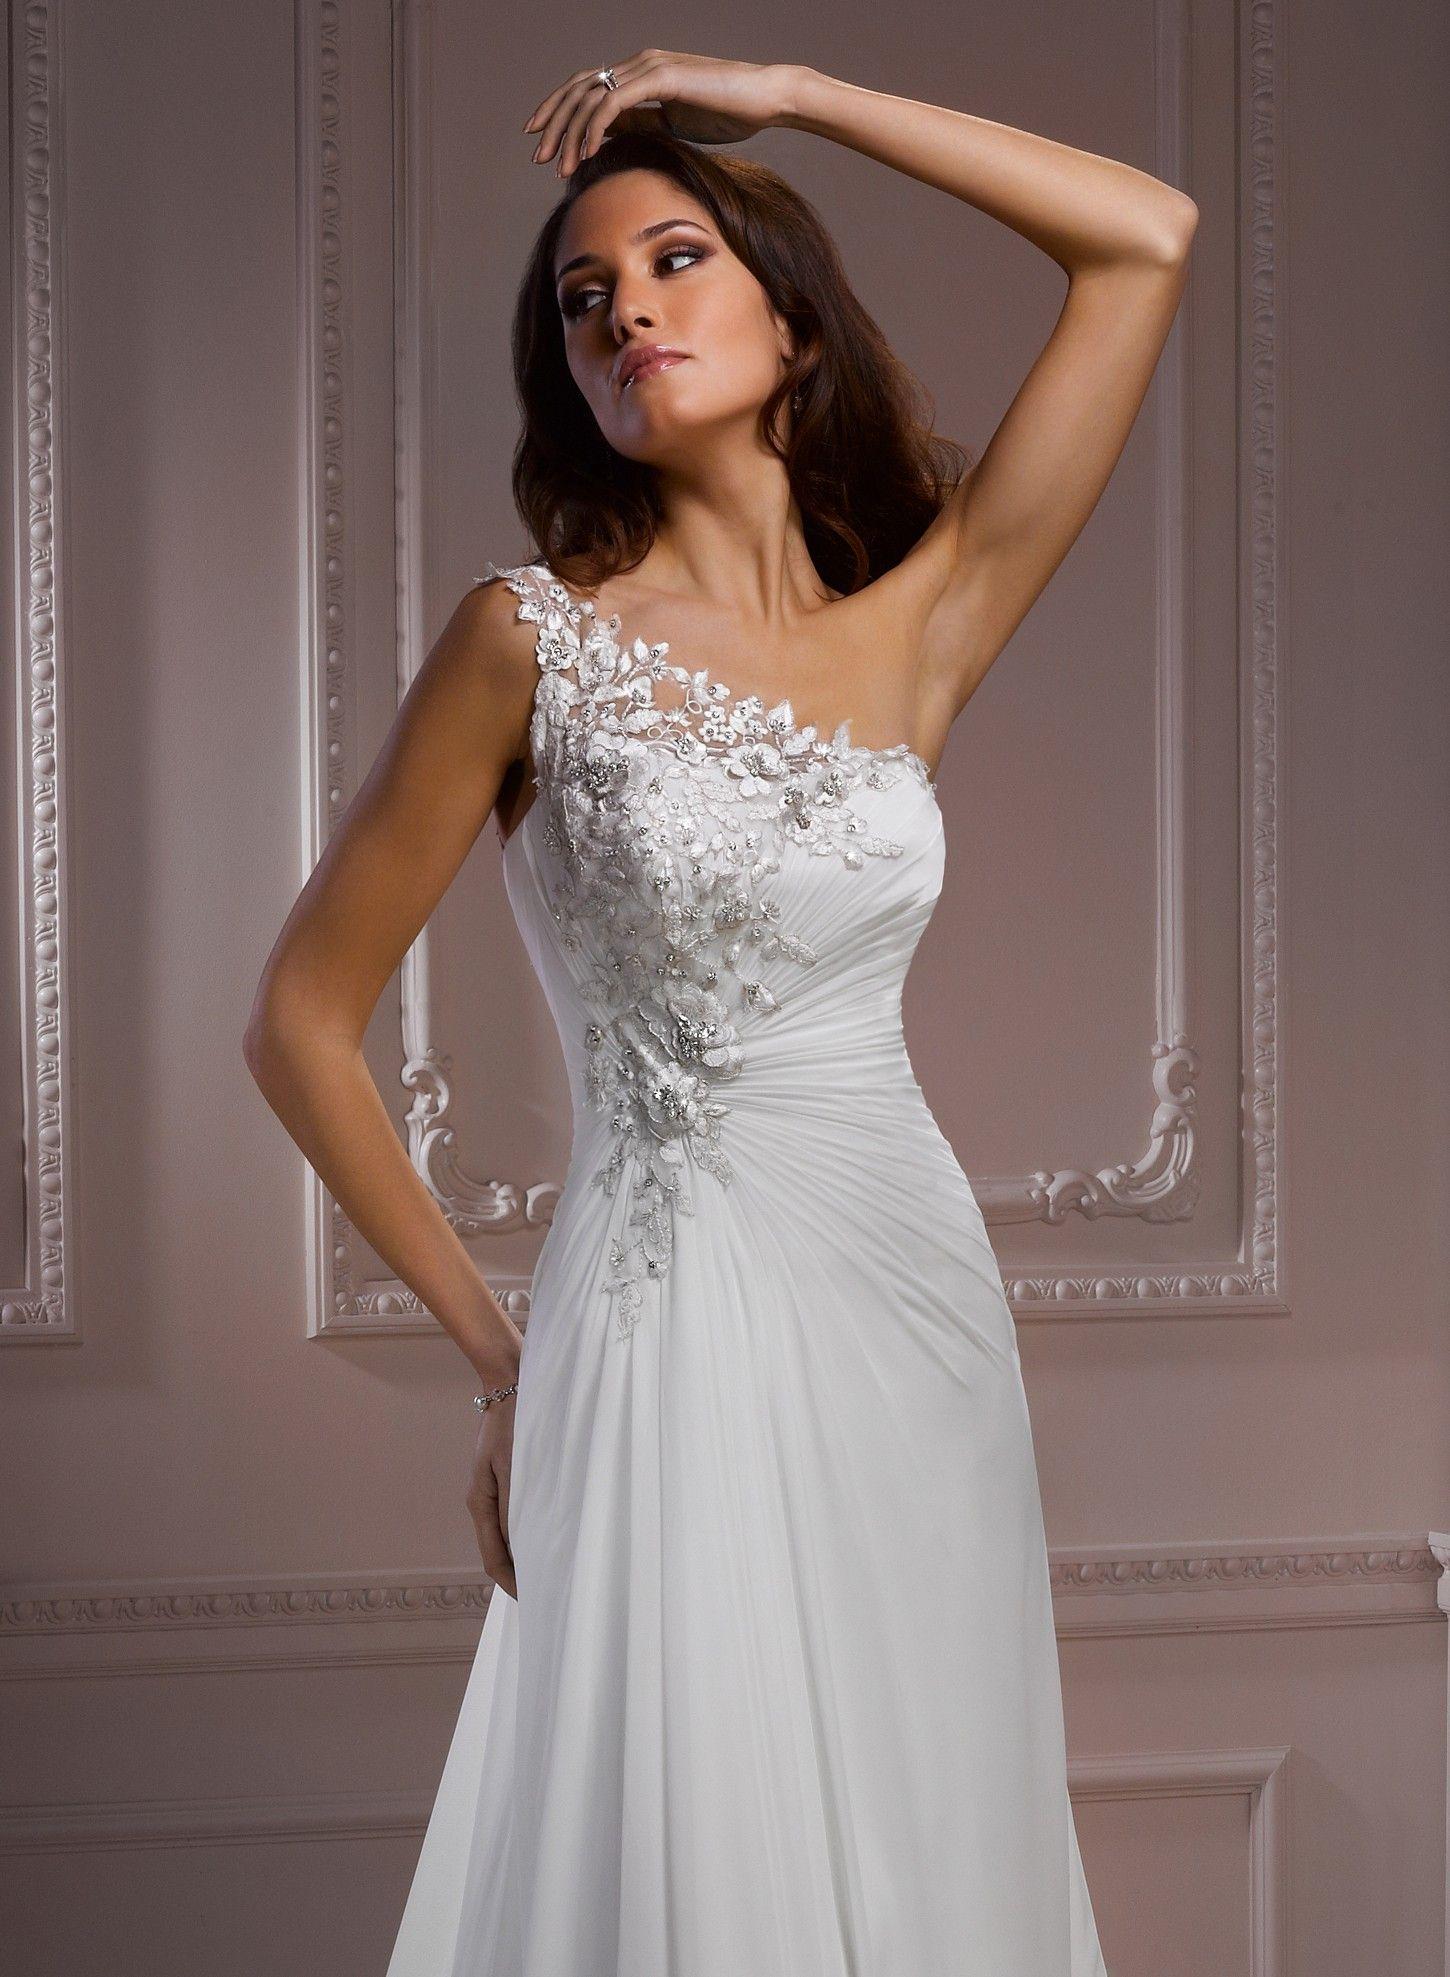 chiffon-one-shoulder-wedding-dress | Chiffon Wedding Dress ...